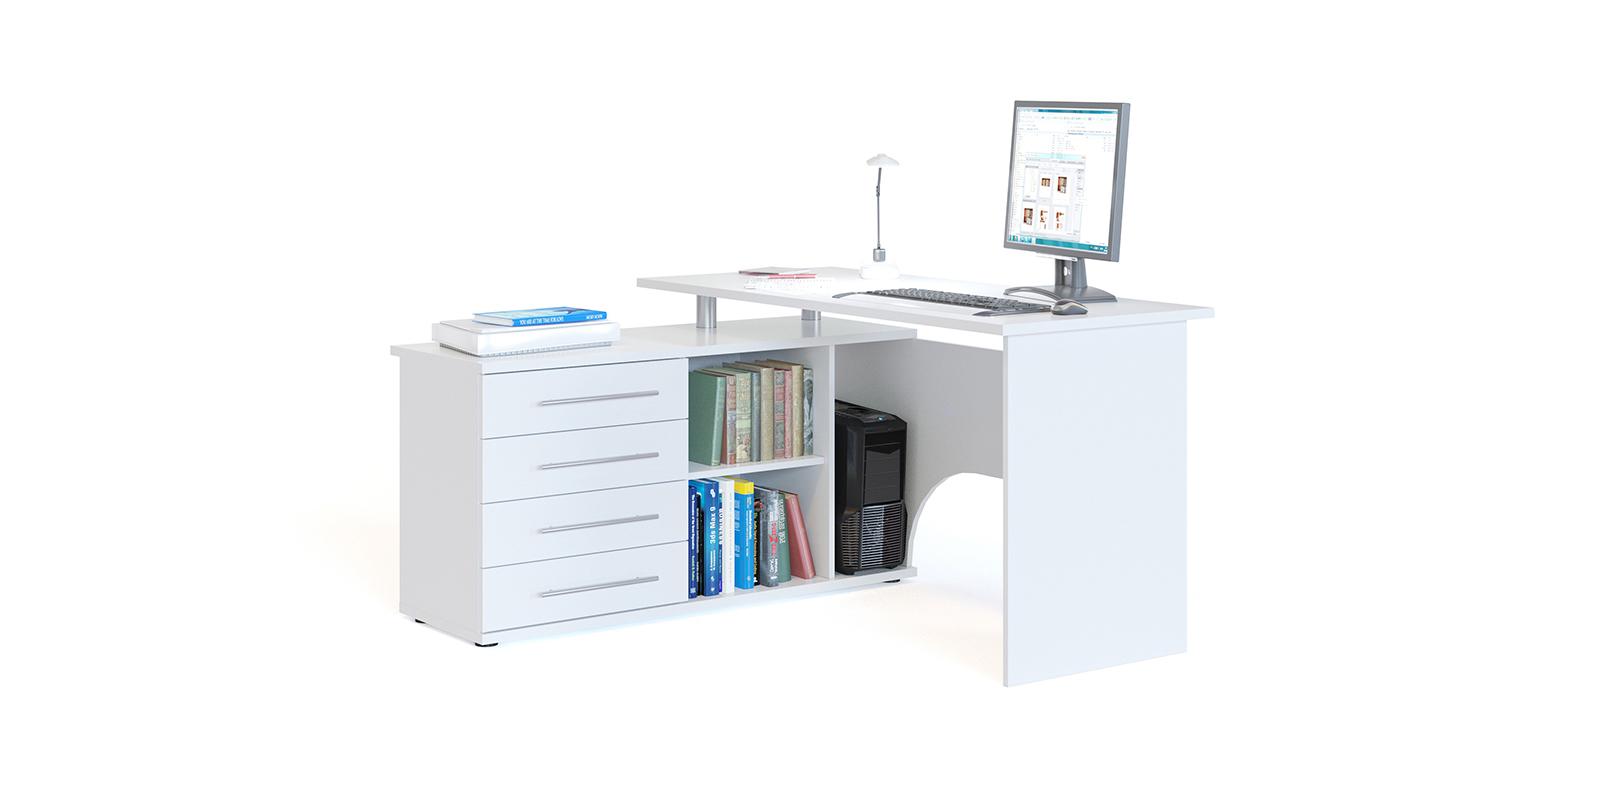 Стол компьютерный Сноу левый угол (белый) Сноу